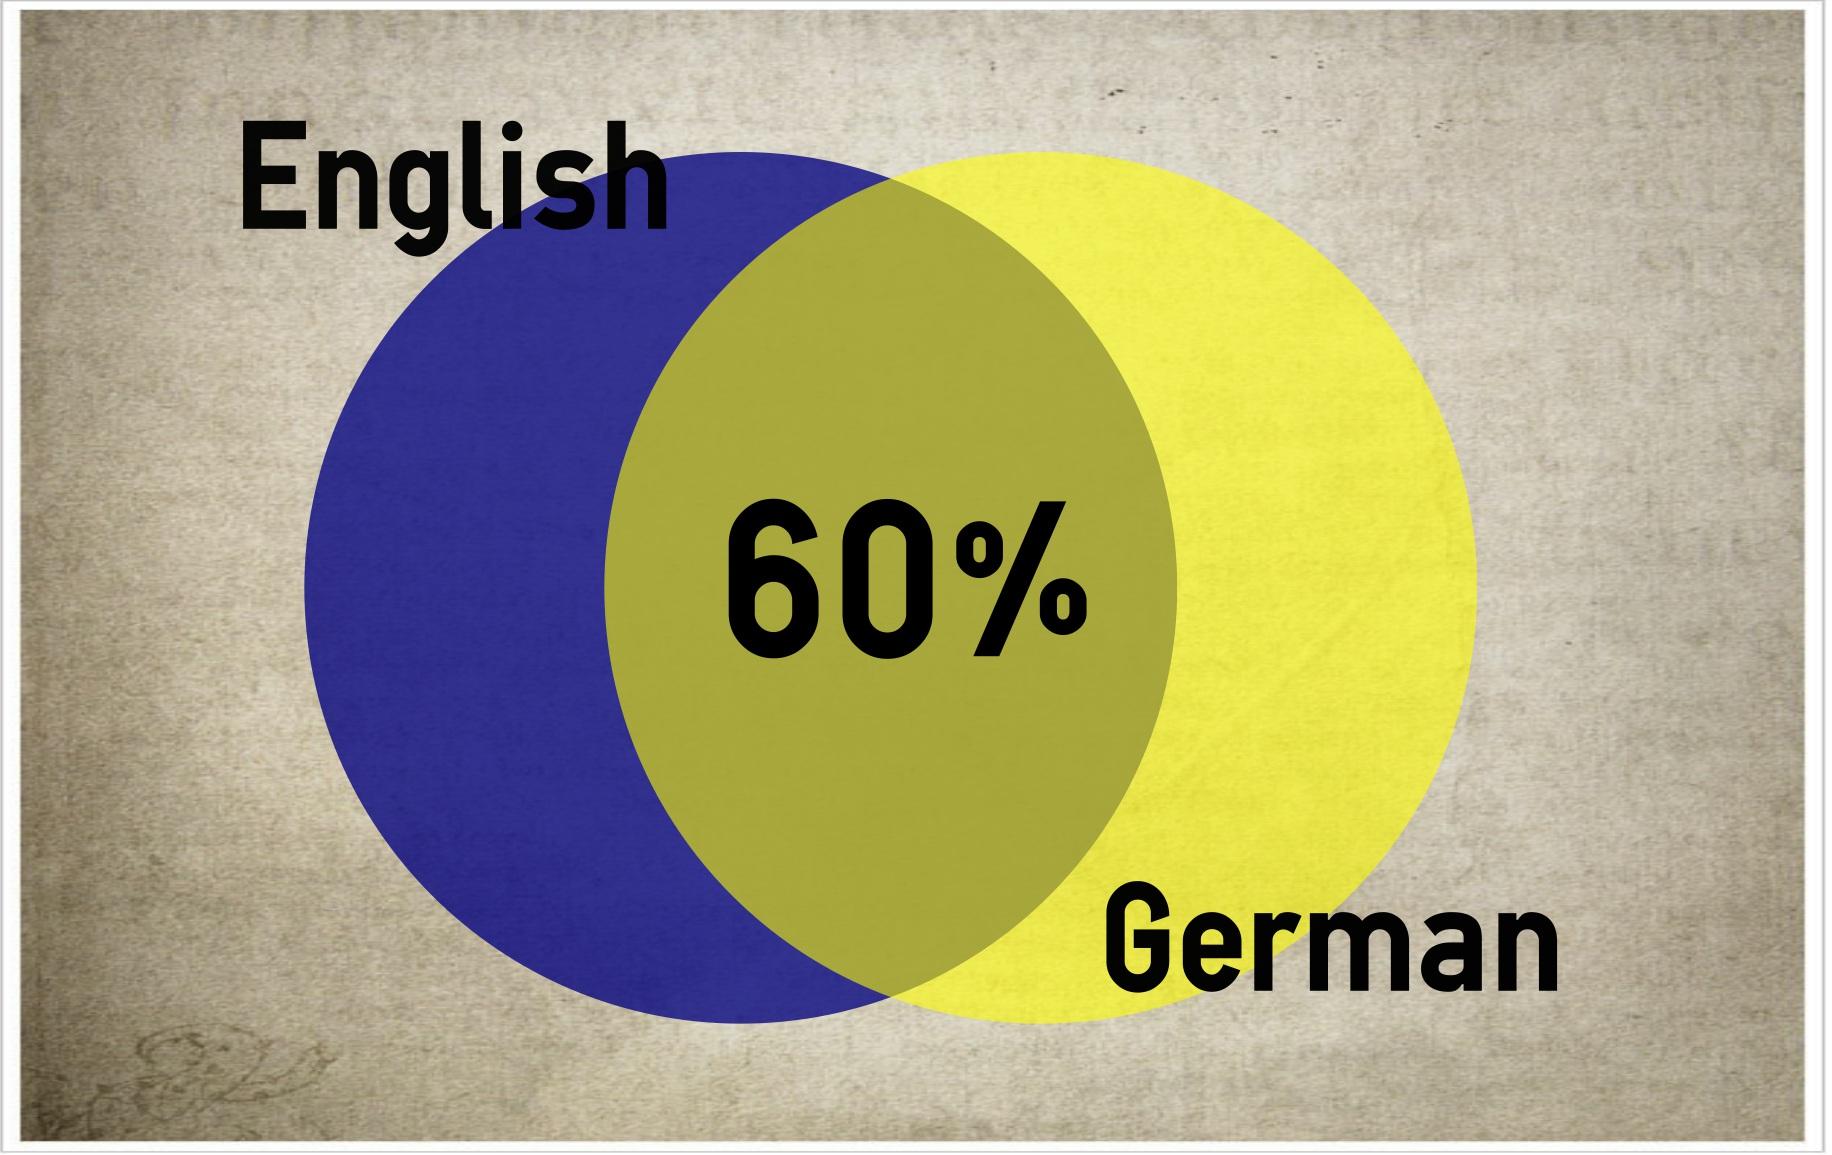 EnglishGerman